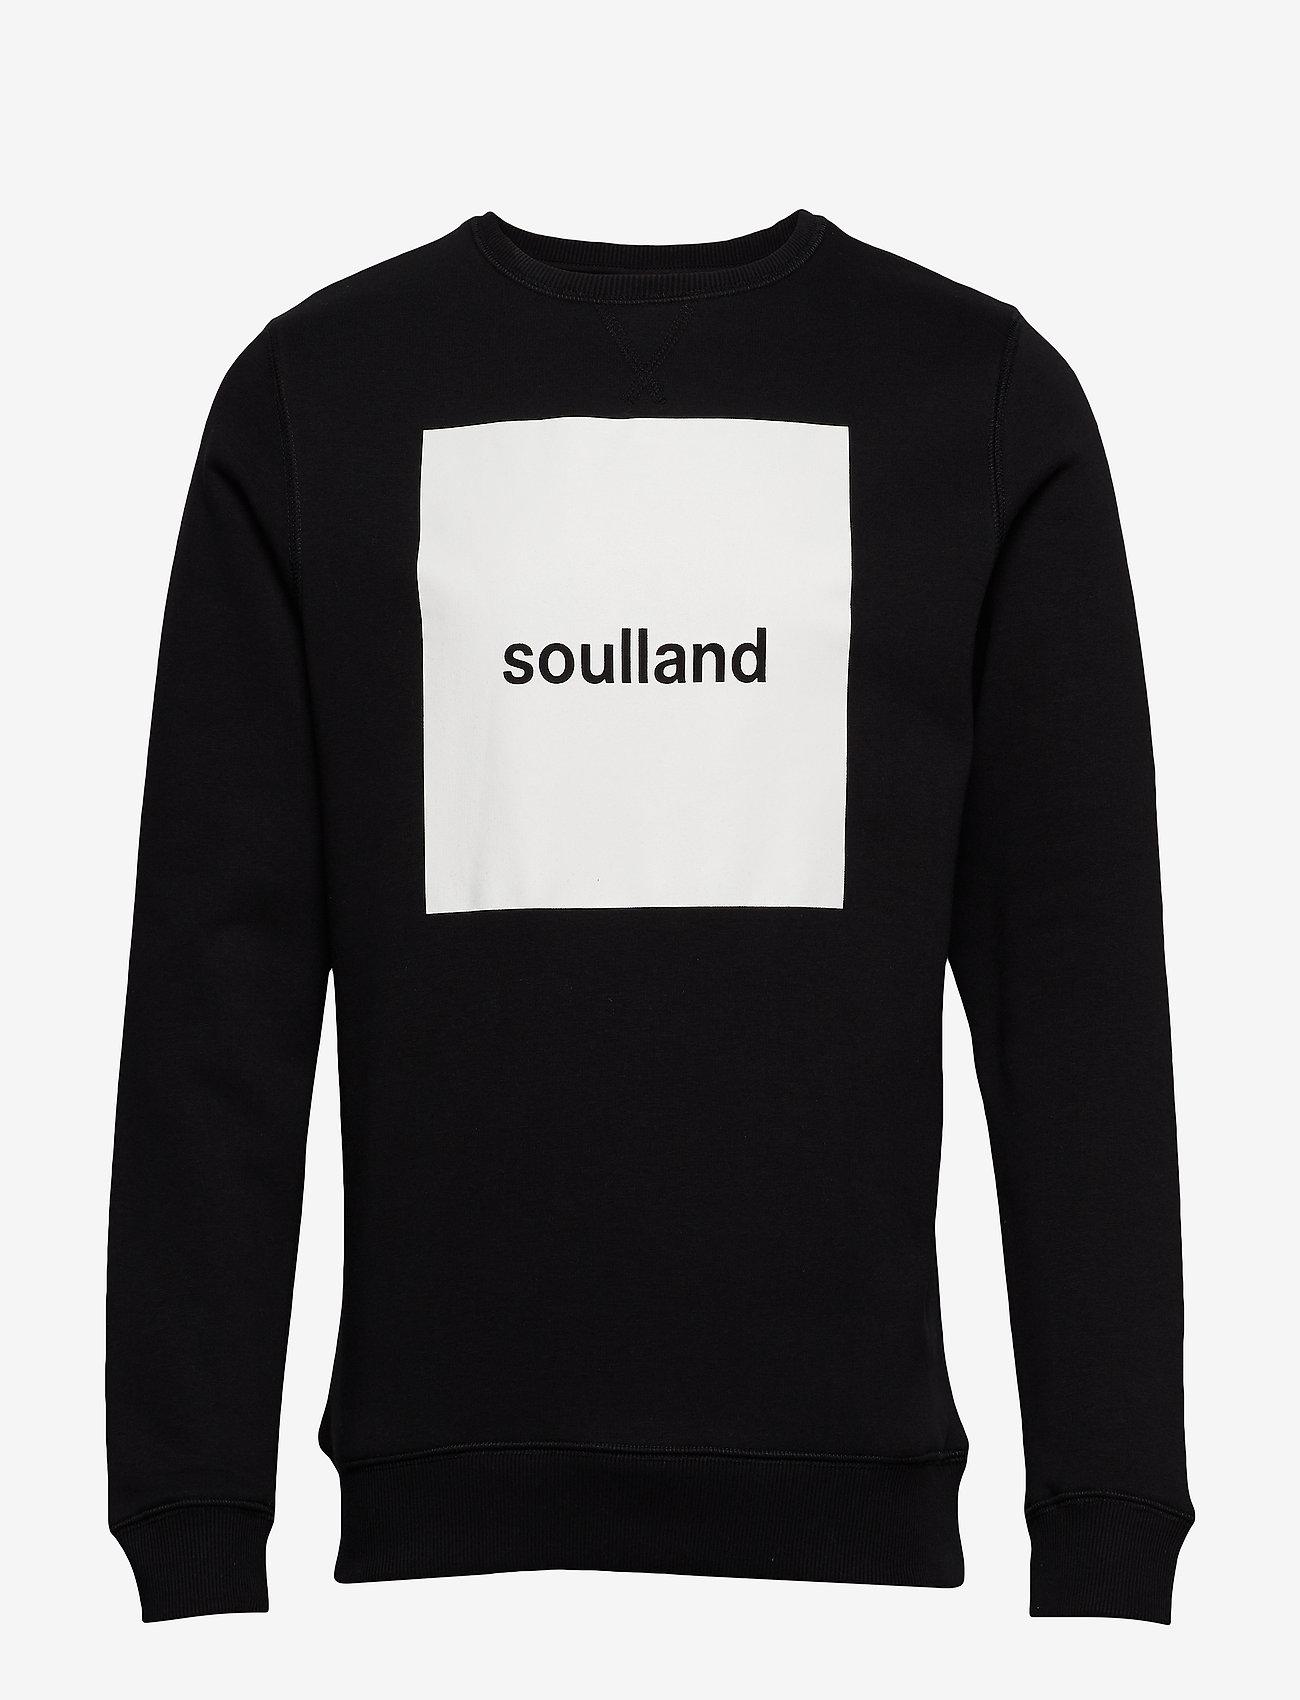 Soulland - ETHAN - sweatshirts - black